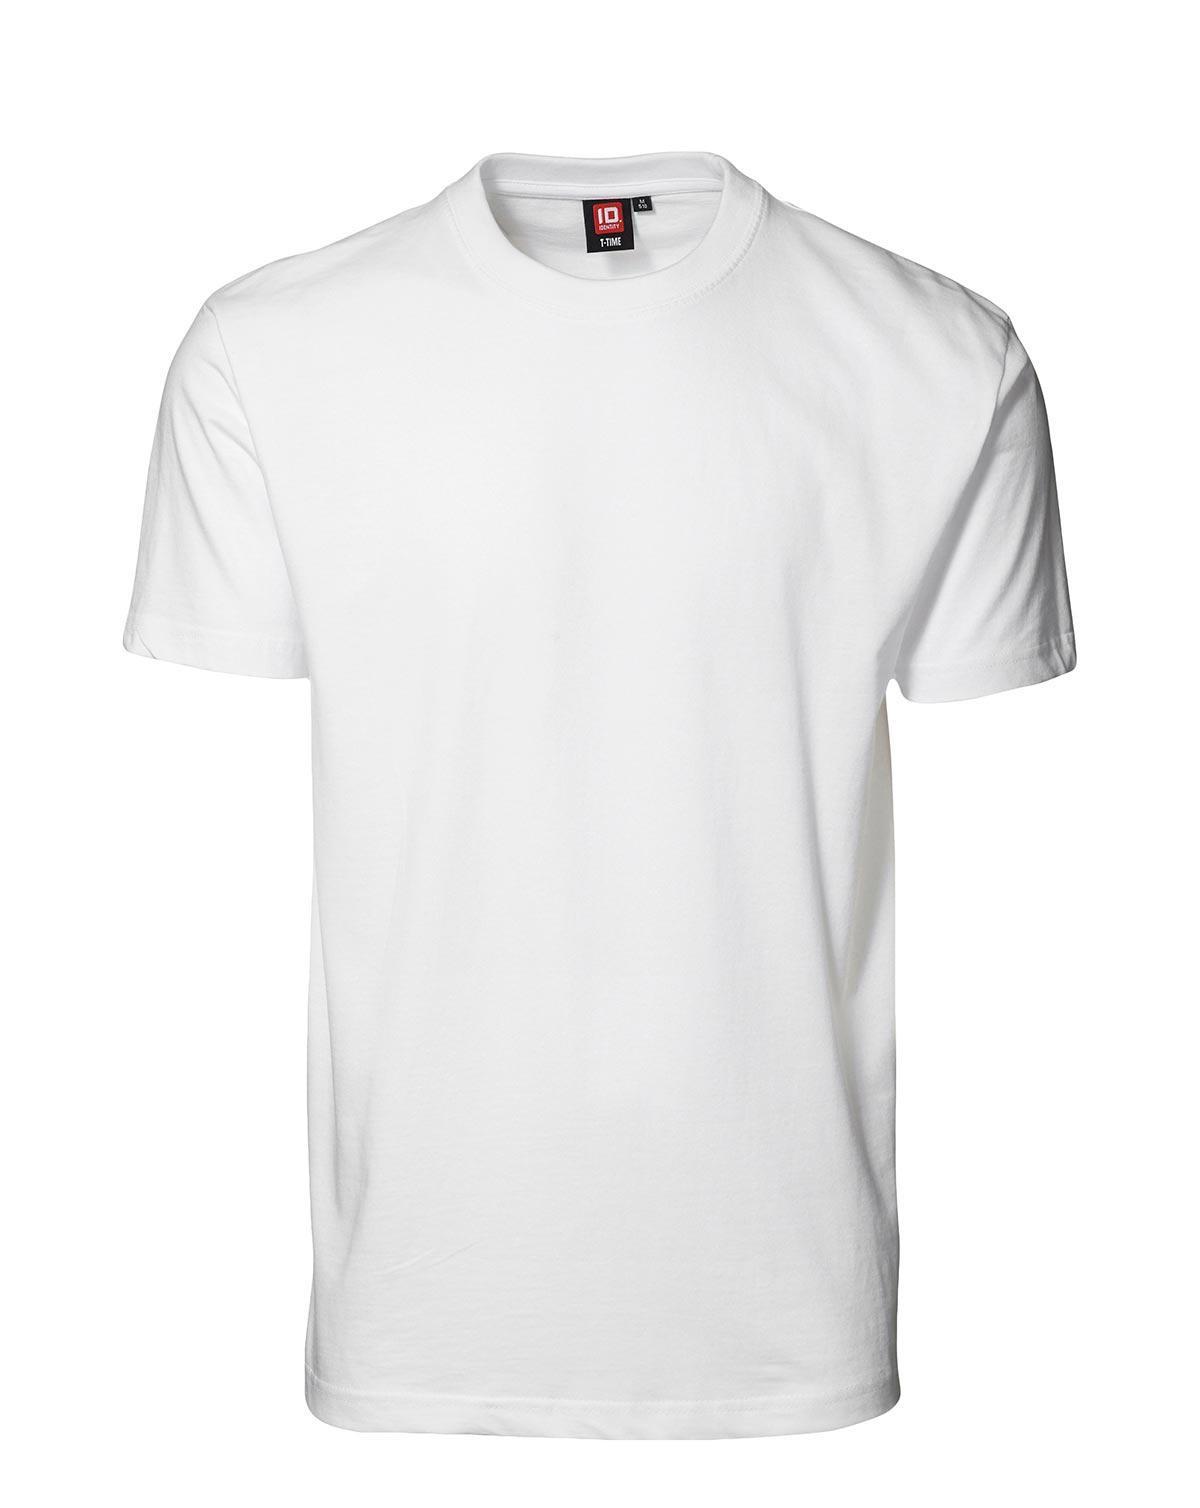 ID T-Time T-shirt, rund hals (Hvid, 6XL)